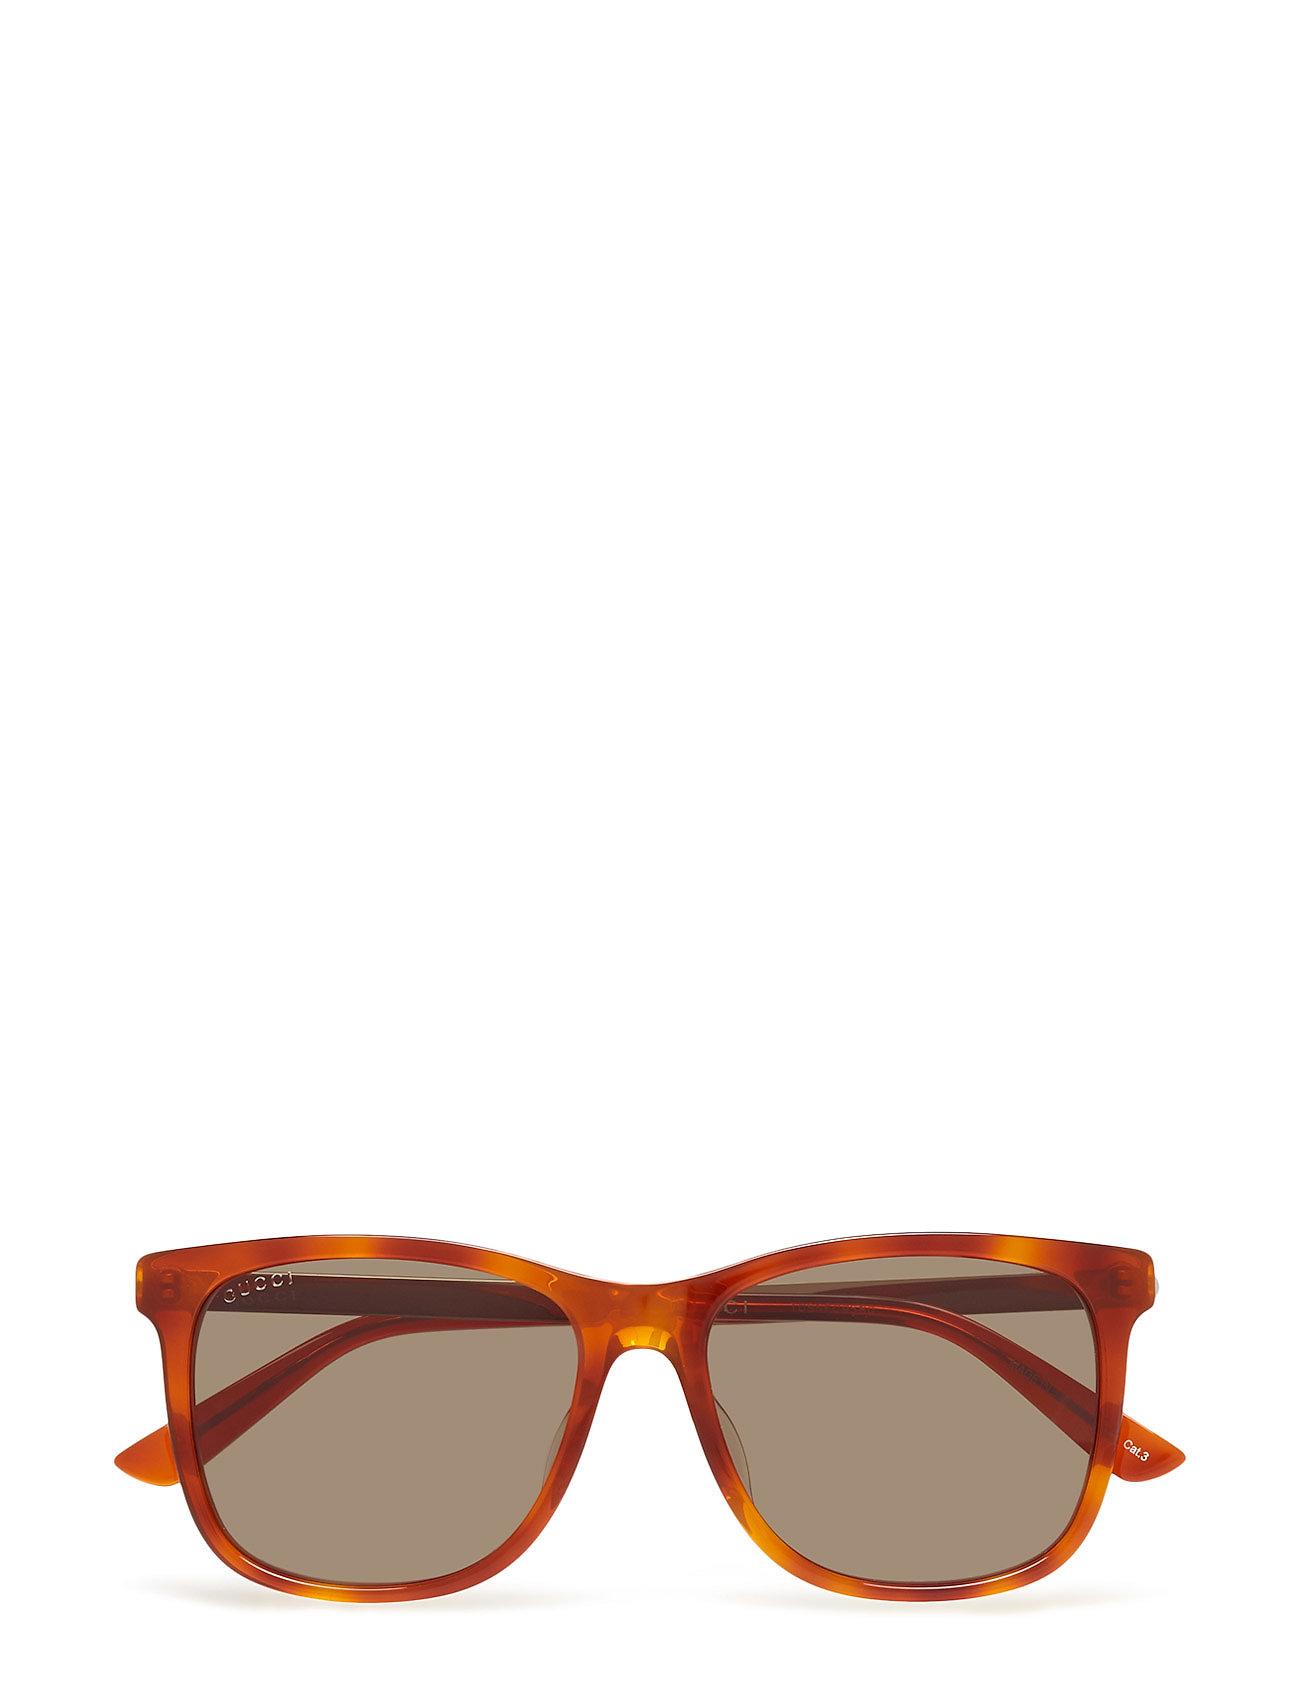 Gucci Sunglasses GG0078SK - AVANA-GOLD-GREEN